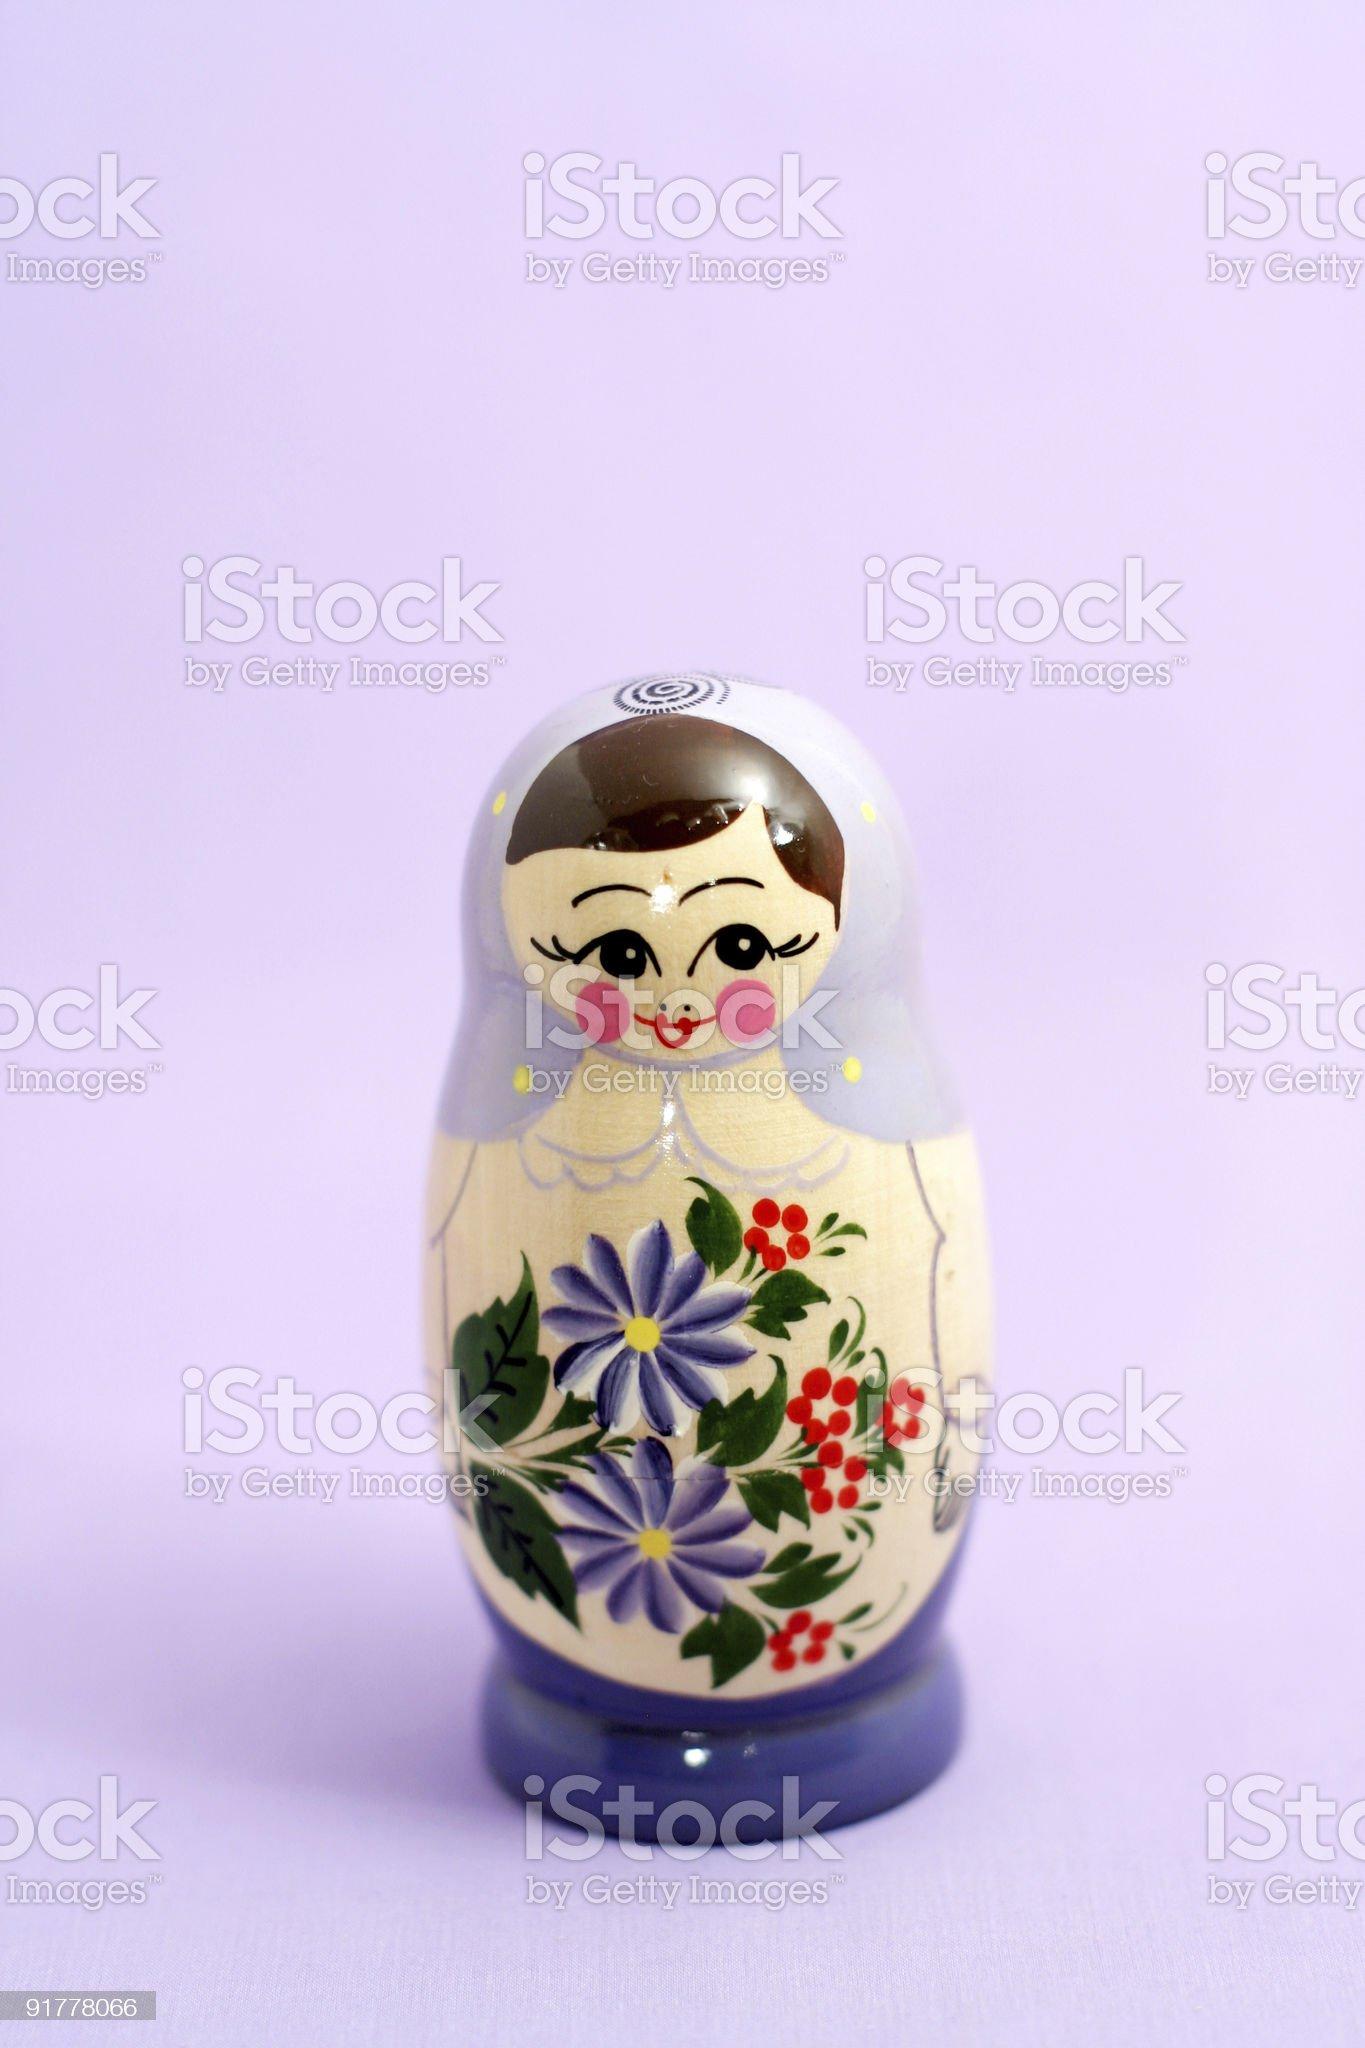 russian nesting doll royalty-free stock photo